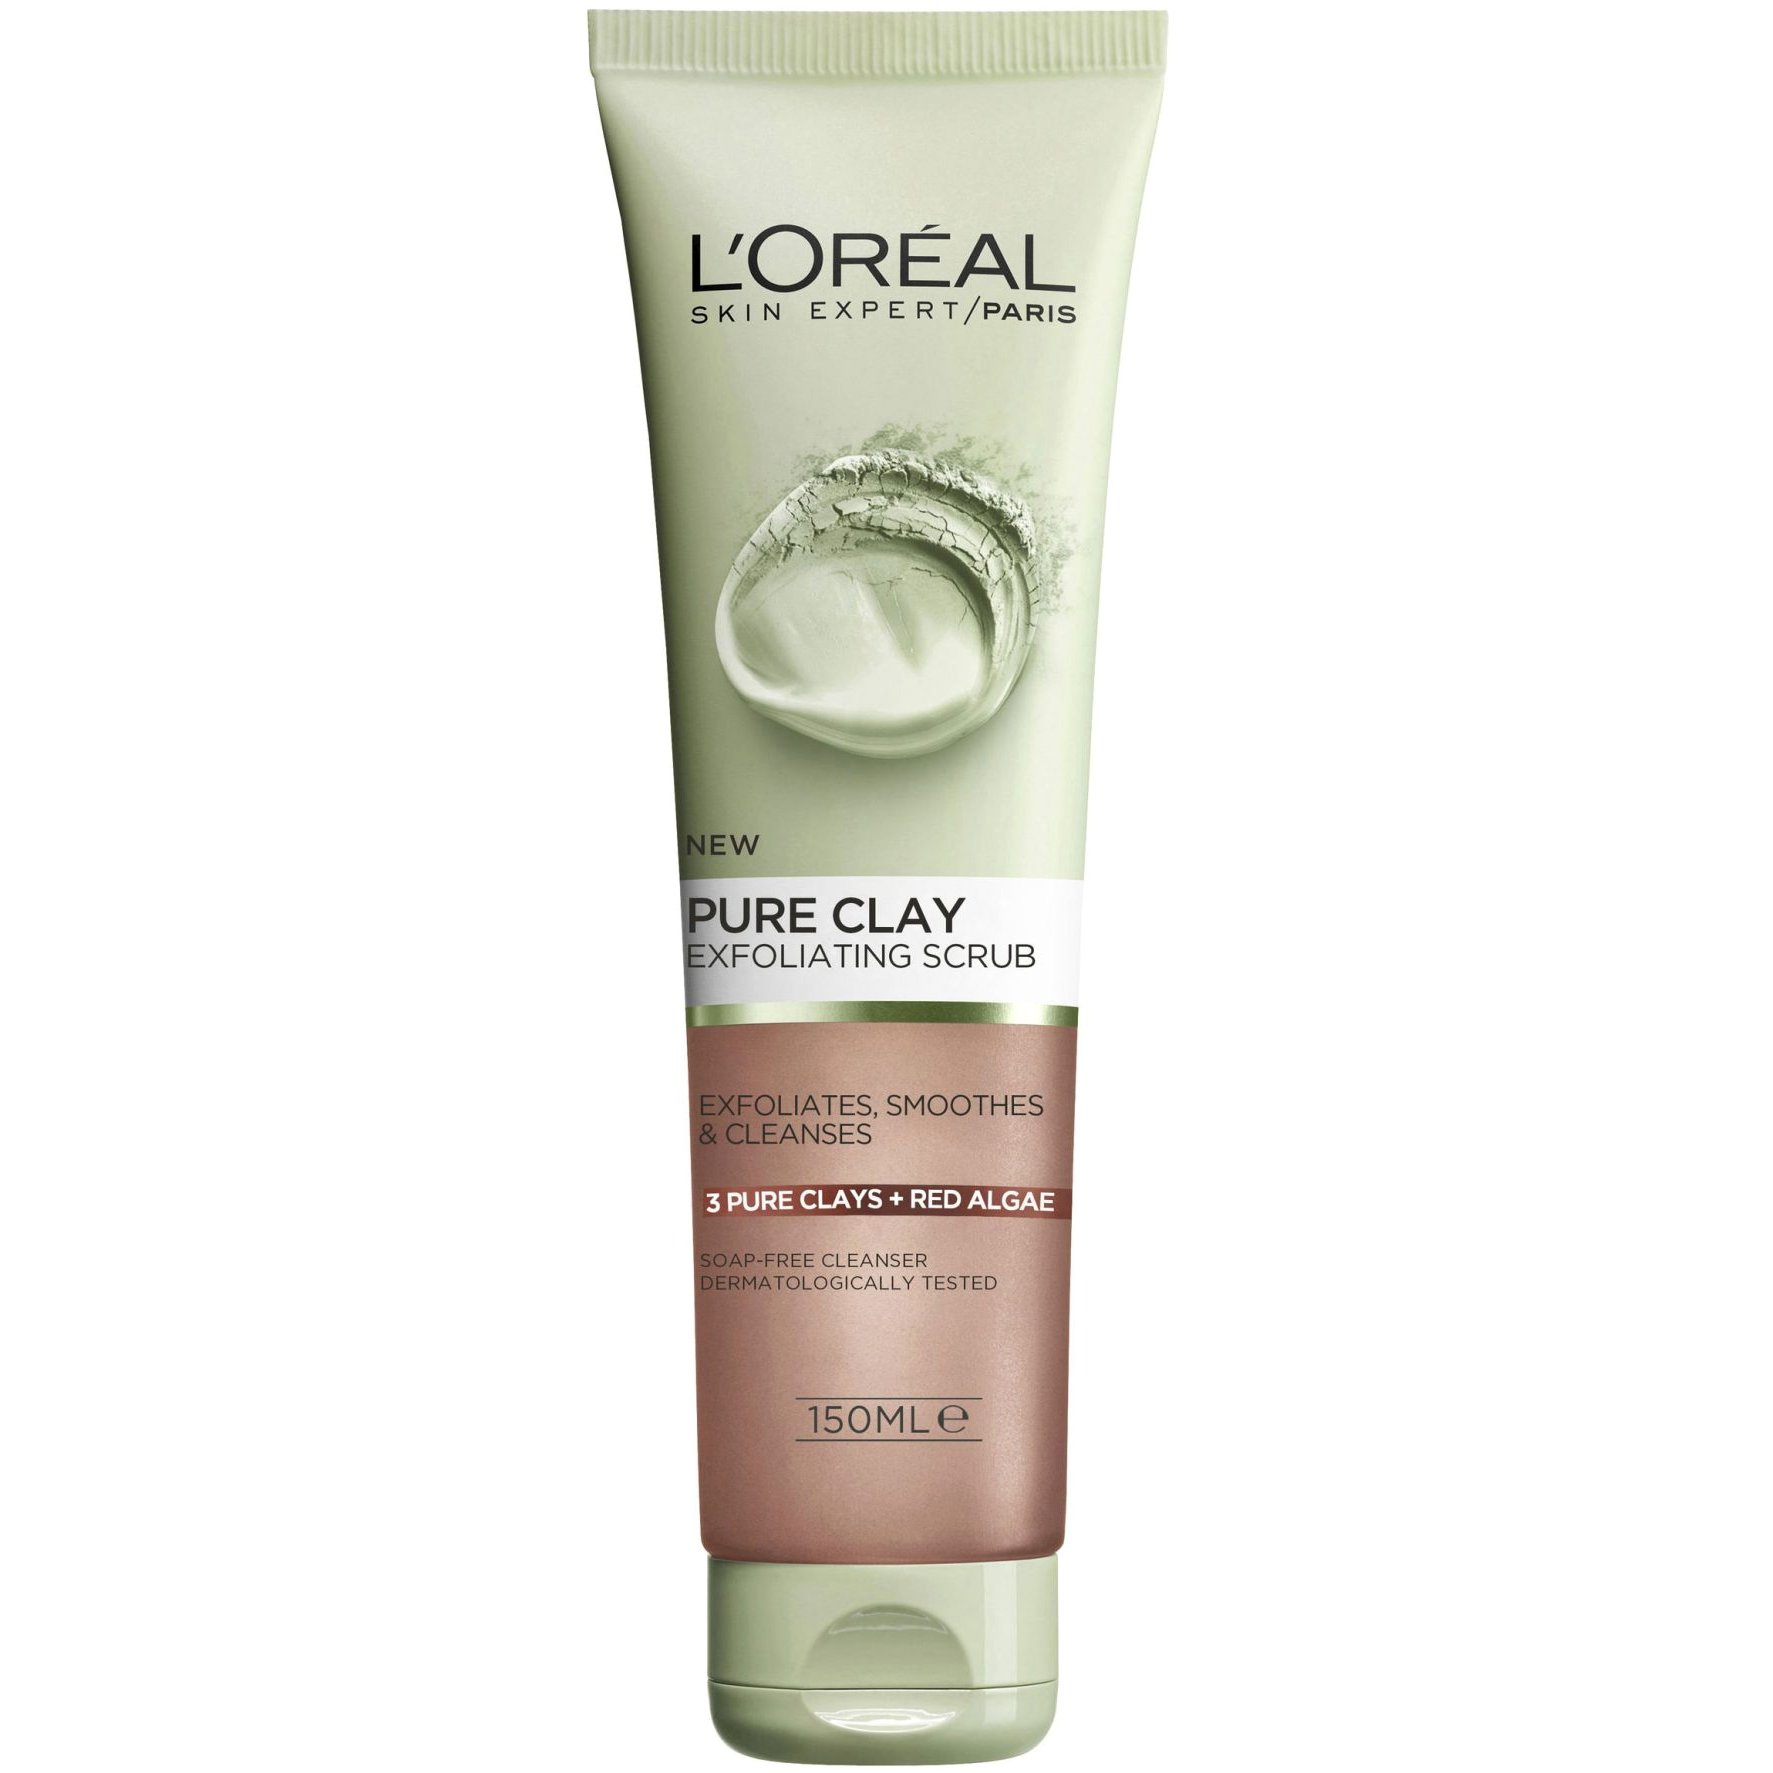 L'oreal Paris Pure Clay Gel Glow Scrub Τζελ Καθαρισμού με Άργιλο για Απολέπιση 150ml